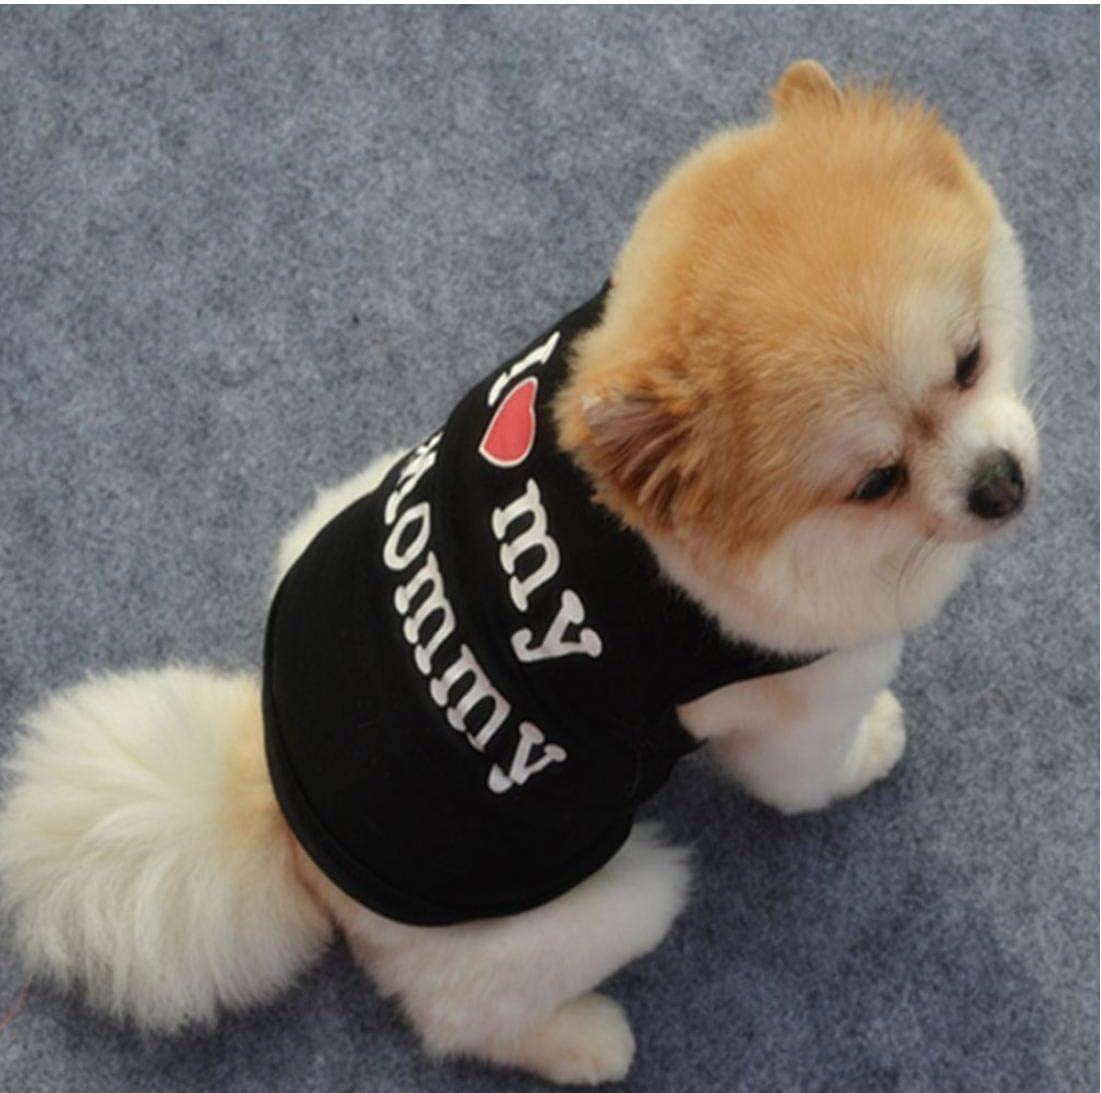 Bontand Precioso Perrito del Chaleco del Verano Camisa del Perro Camiseta De Secci/ón Ligera De Algod/ón para Perros Chaleco Camisetas Letters Ropa del Patr/ón